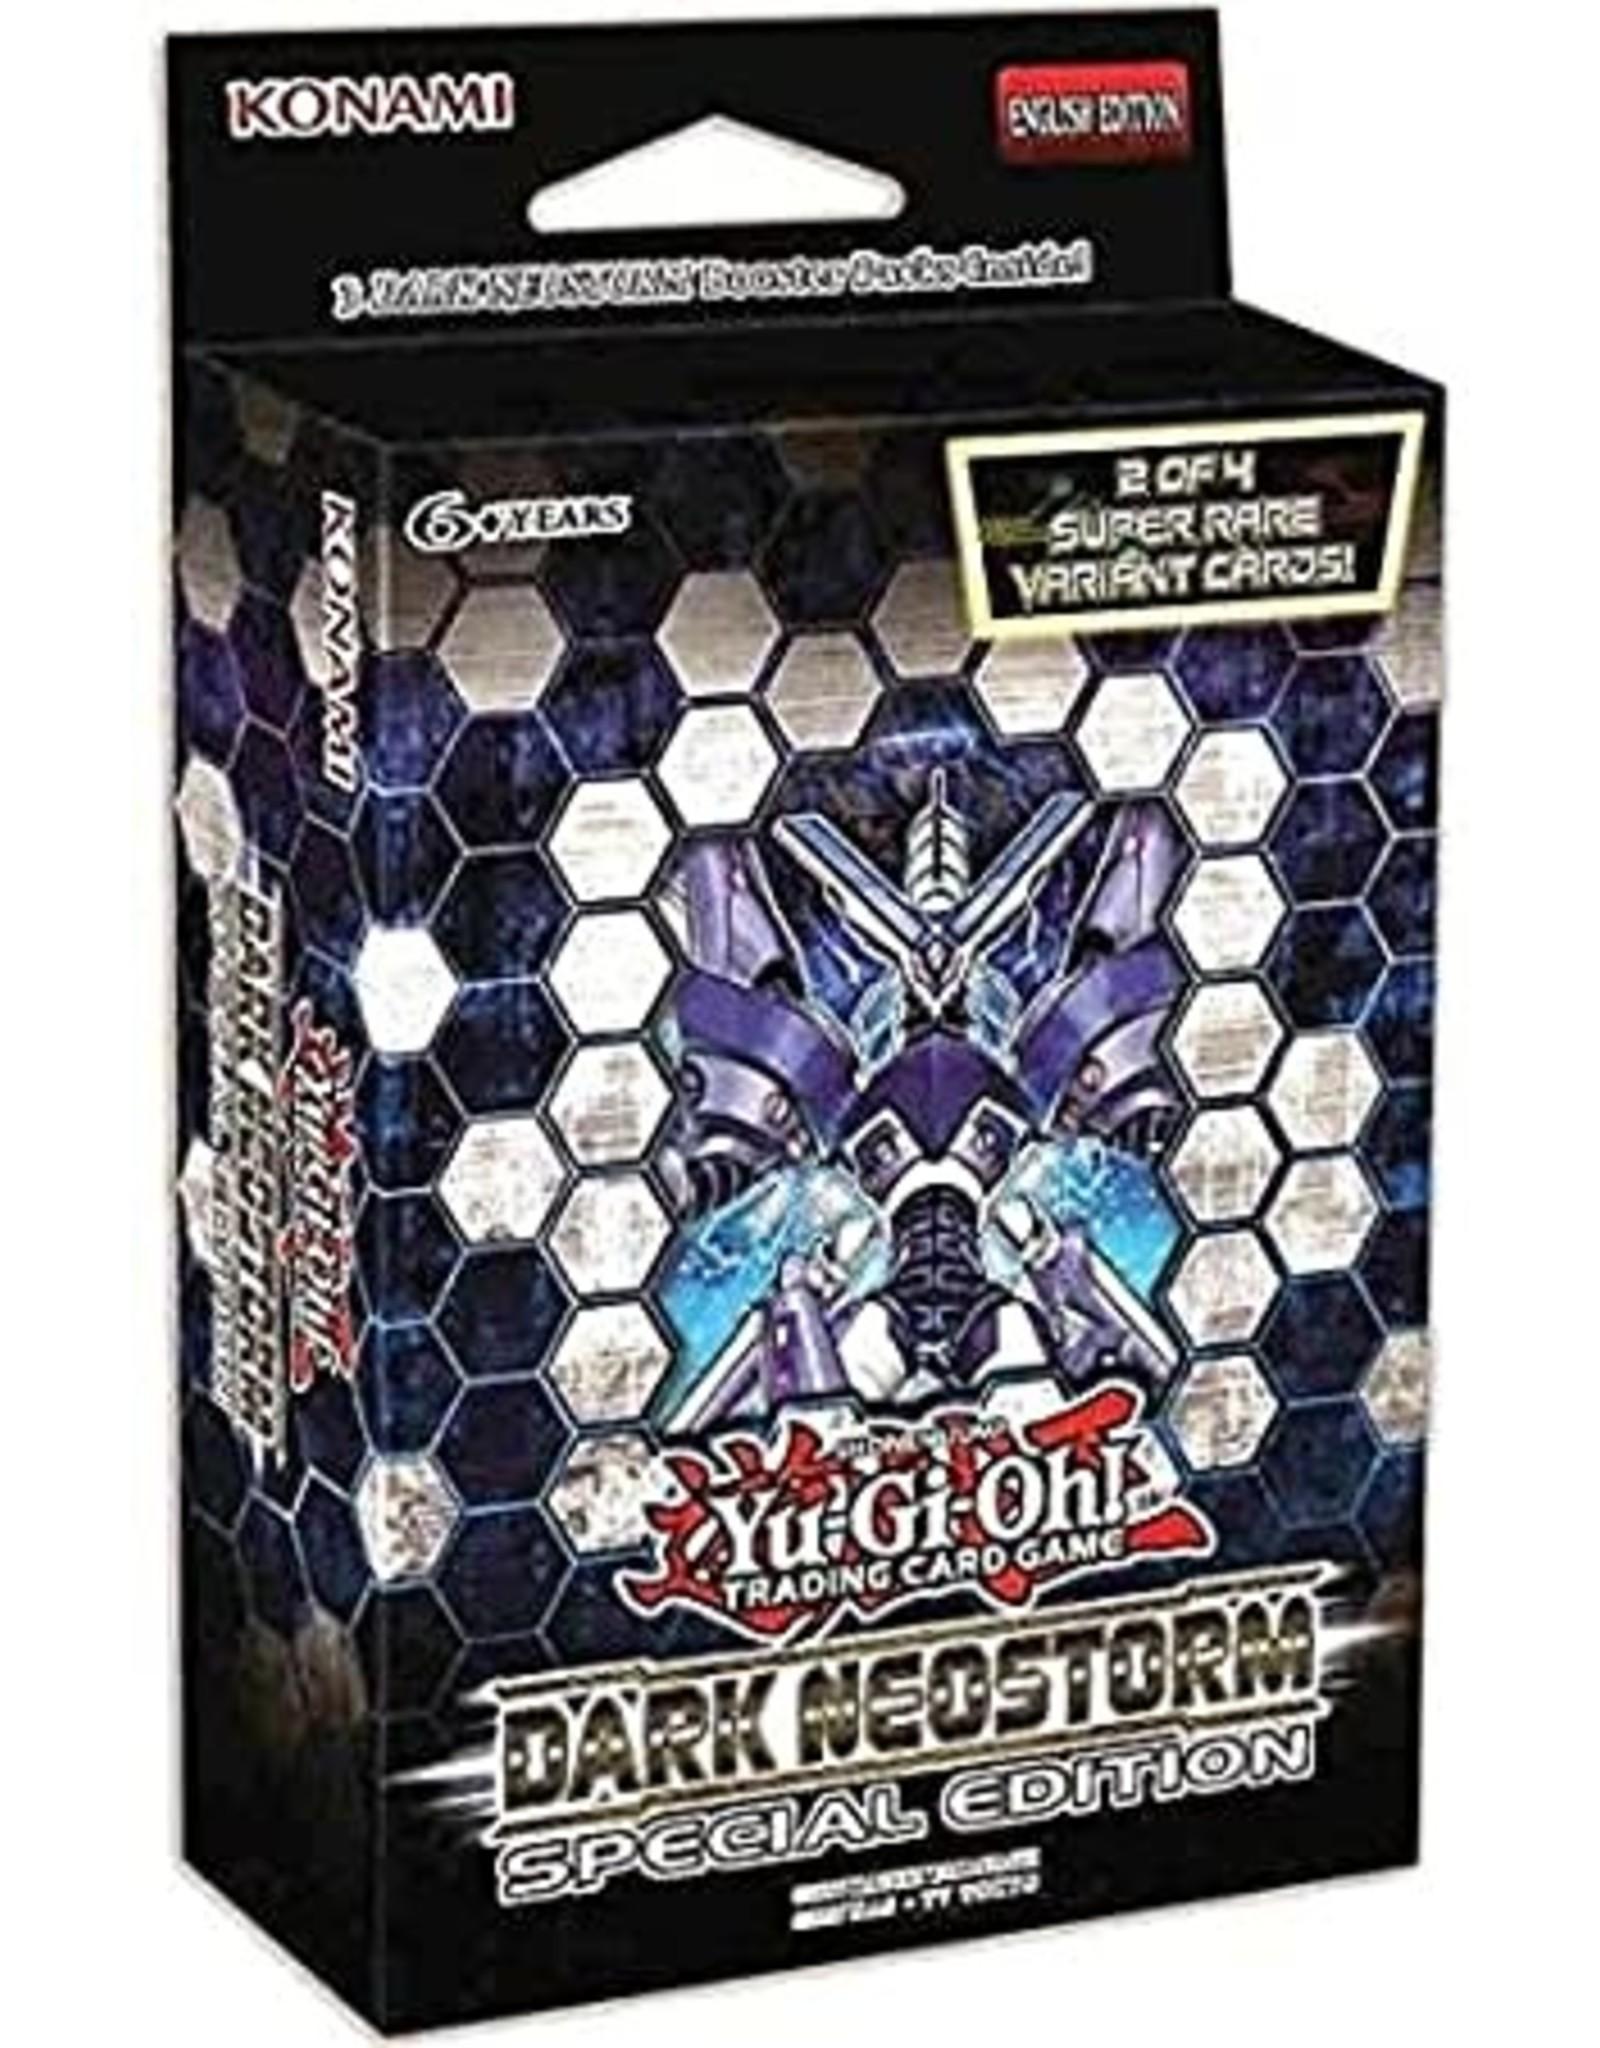 Konami Dark Neostorm Special Edition single